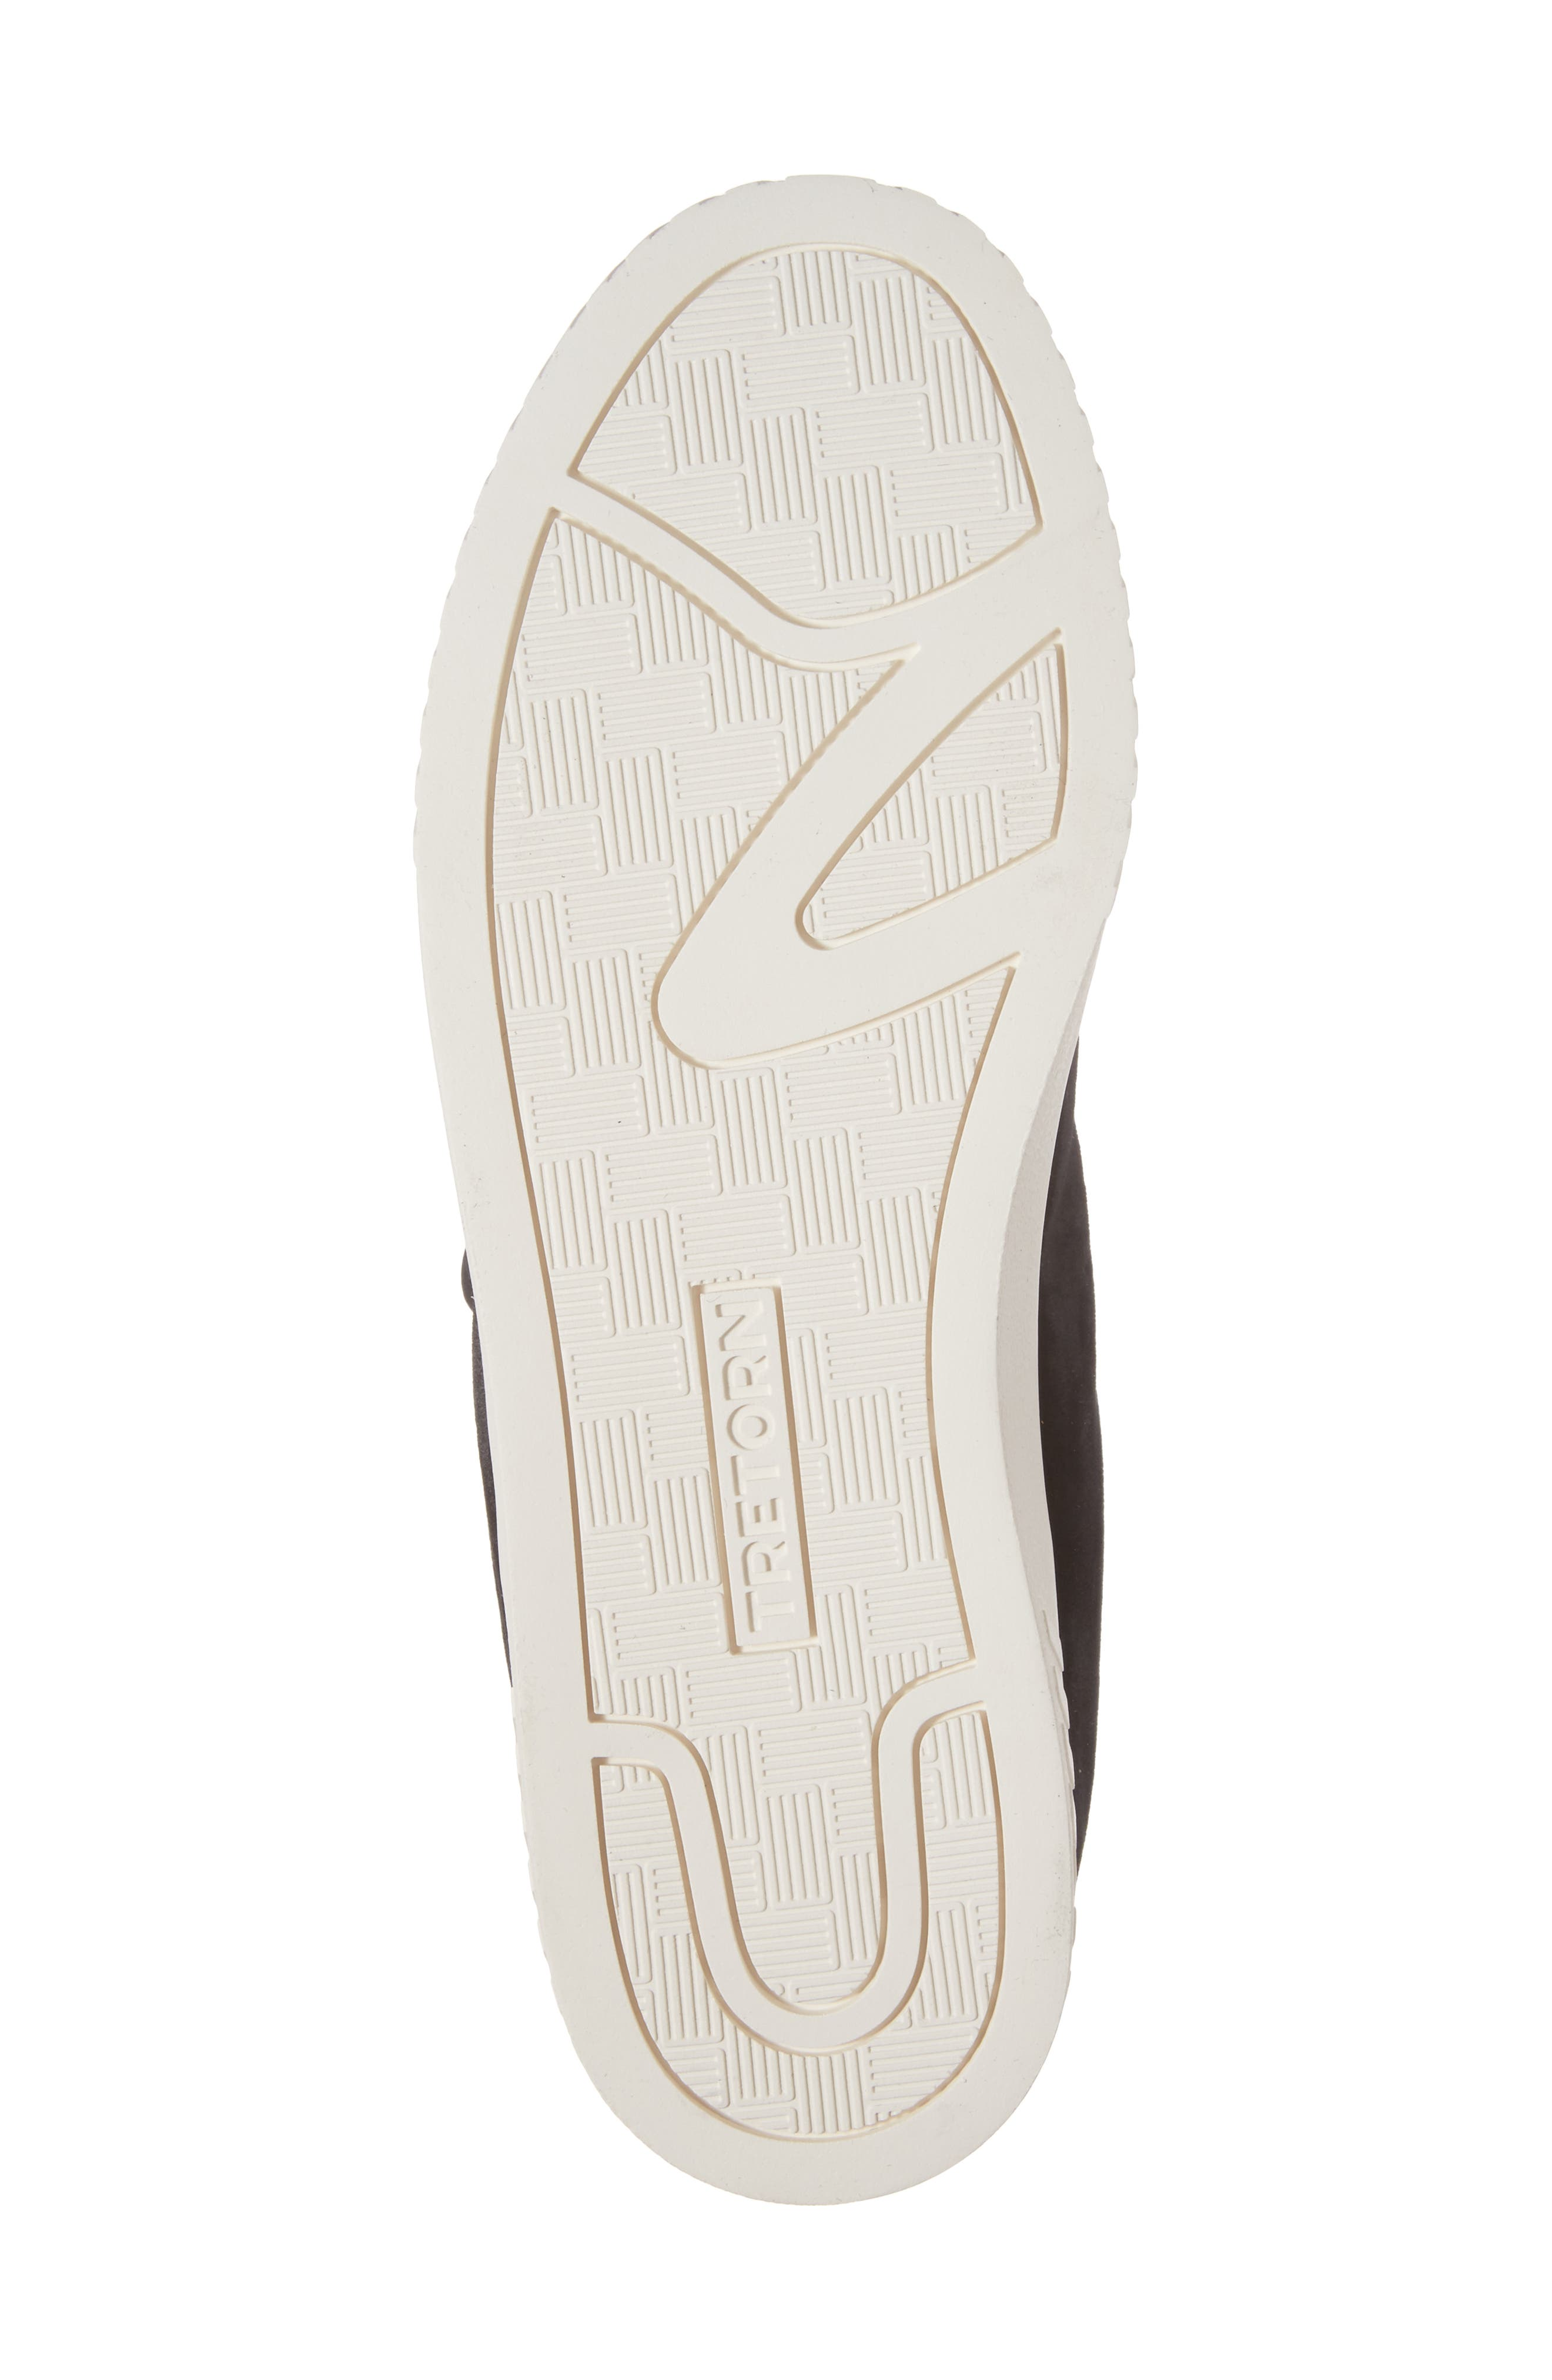 Carry Sneaker,                             Alternate thumbnail 6, color,                             001